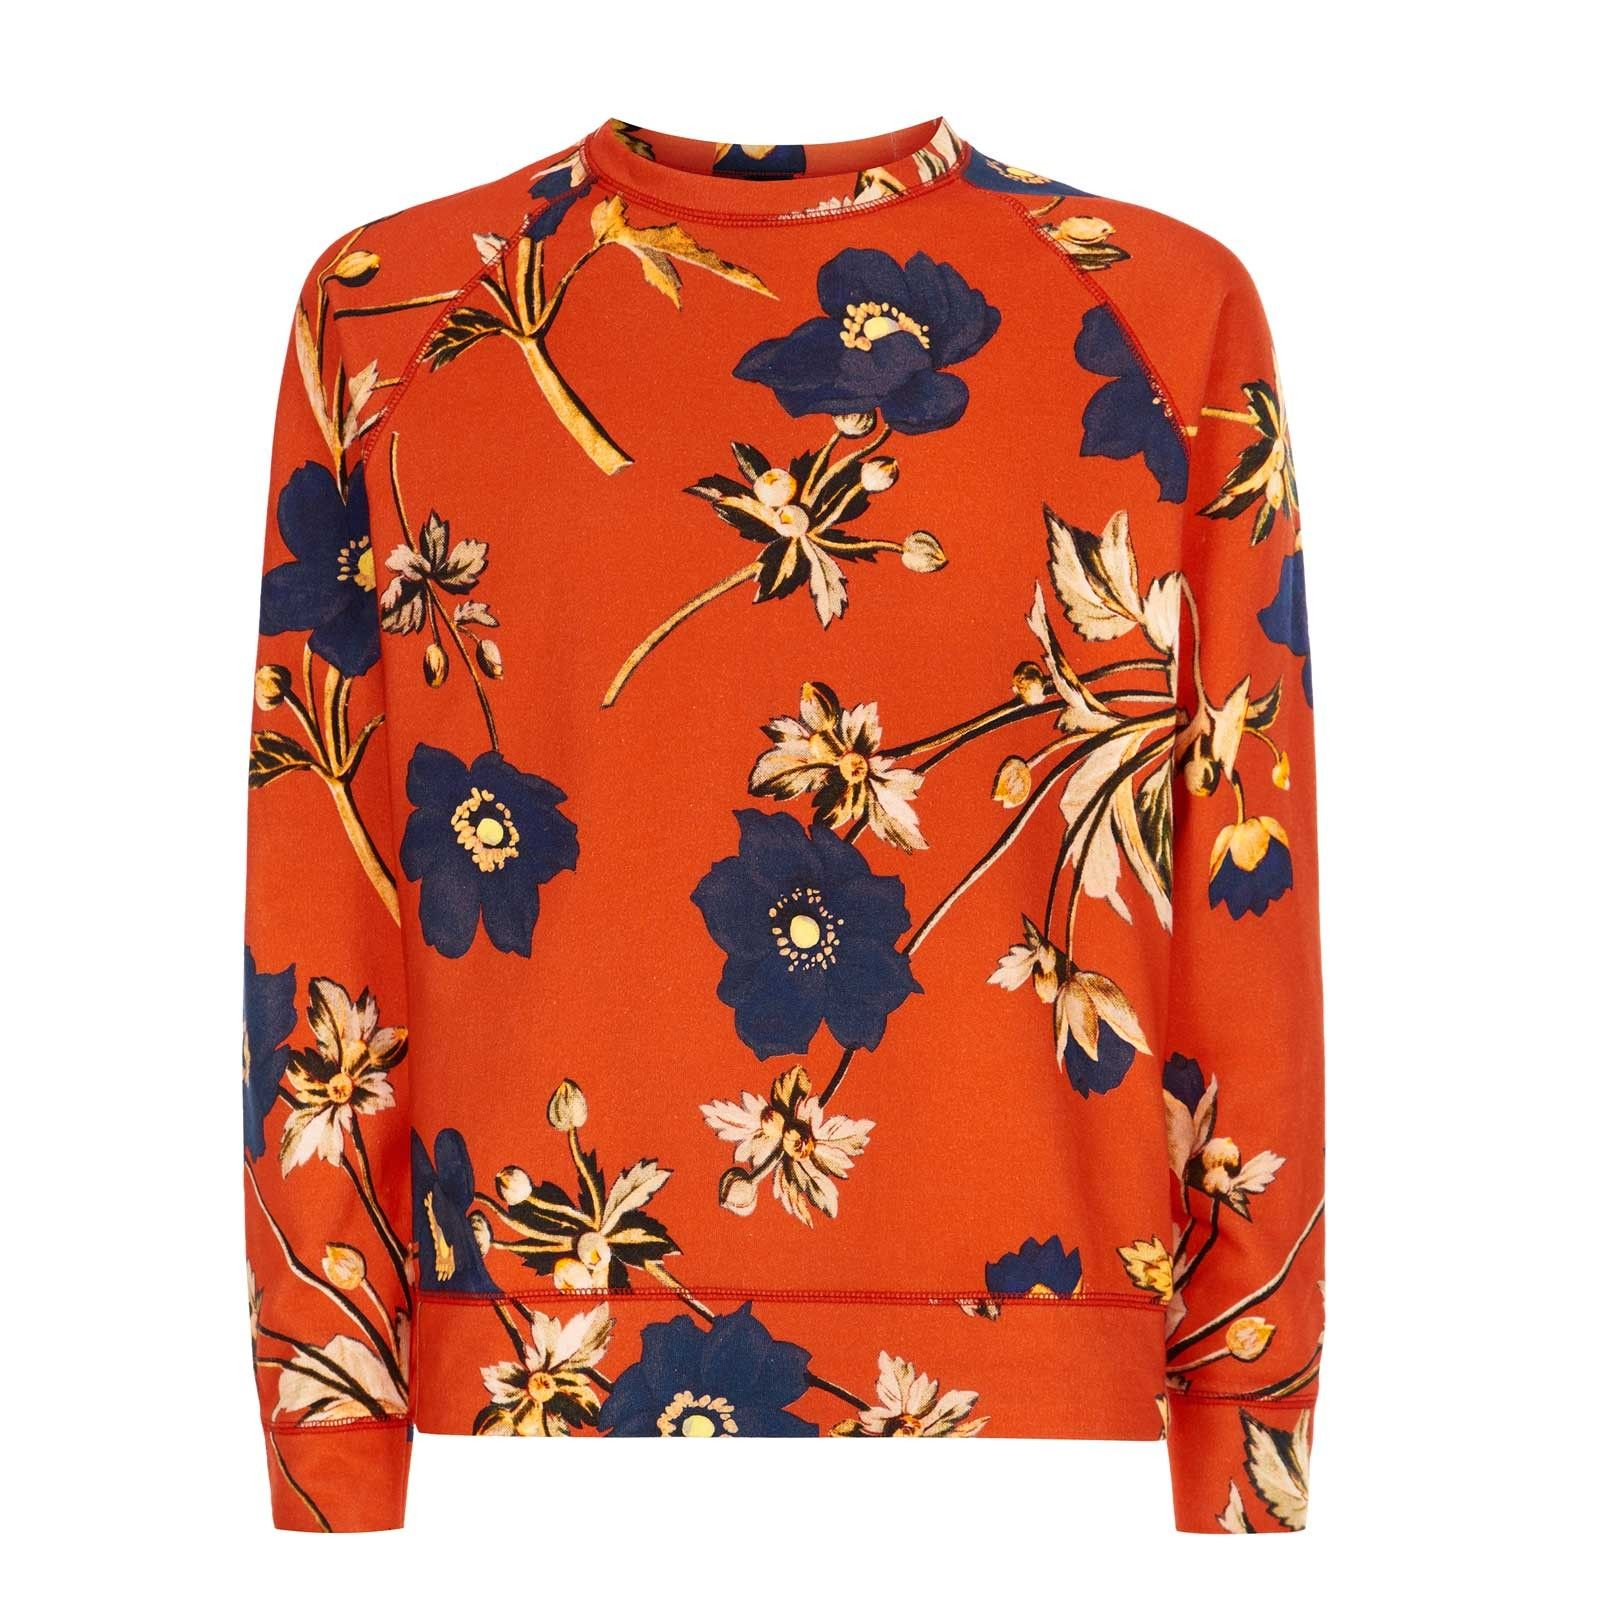 POPPIUM Cotton Sweatshirt - 60's Red  Was £185, now £130 http://www.houseofhackney.com/sale/poppium-cotton-sweatshirt-red.html